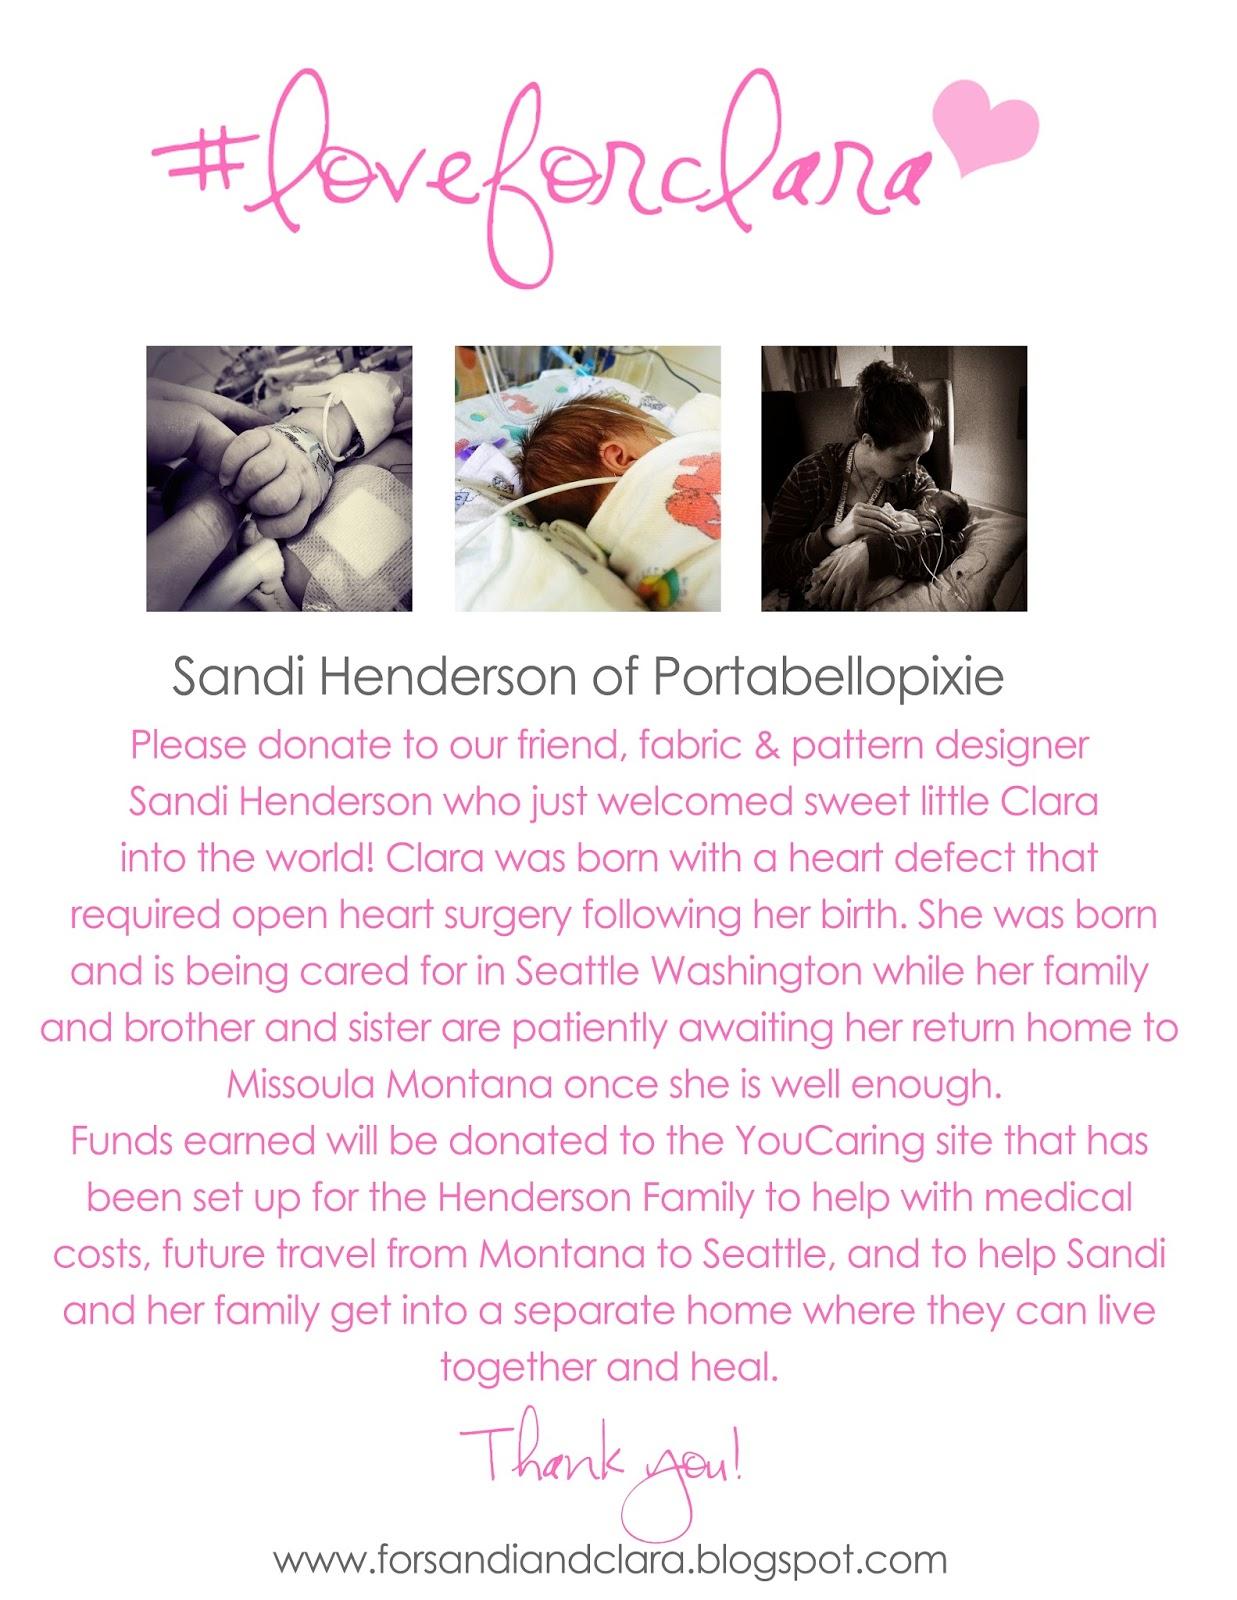 www.forsandiandclara.blogspot.com